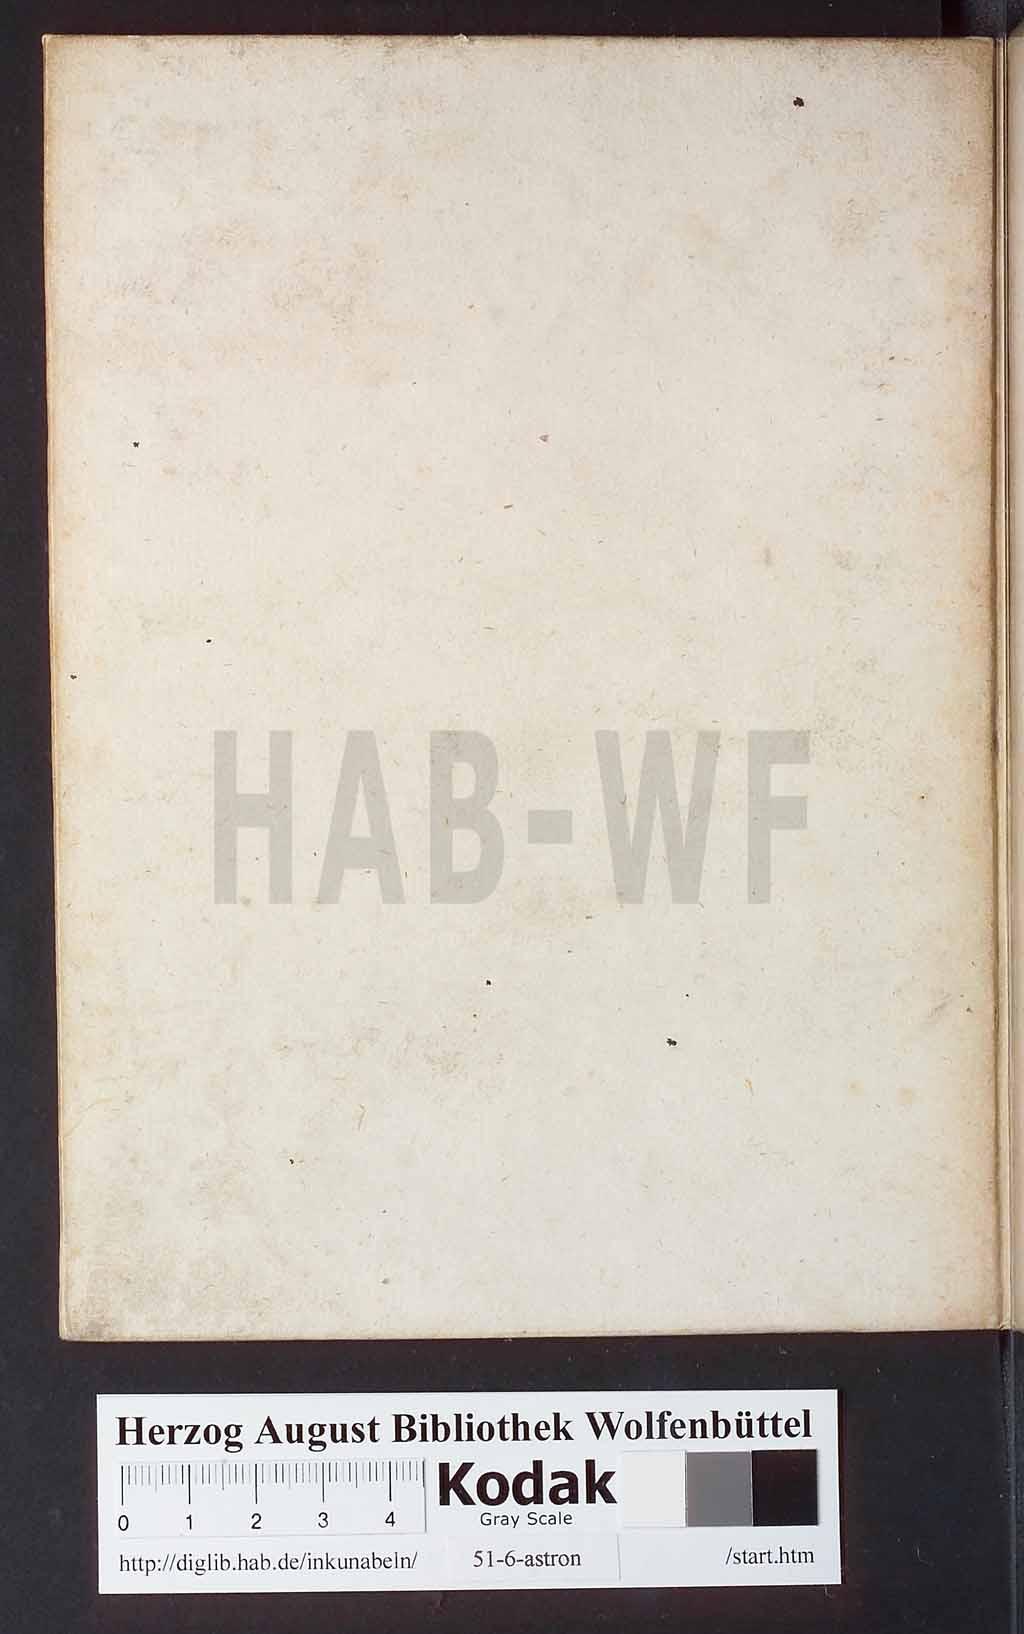 http://diglib.hab.de/inkunabeln/51-6-astron/00086.jpg